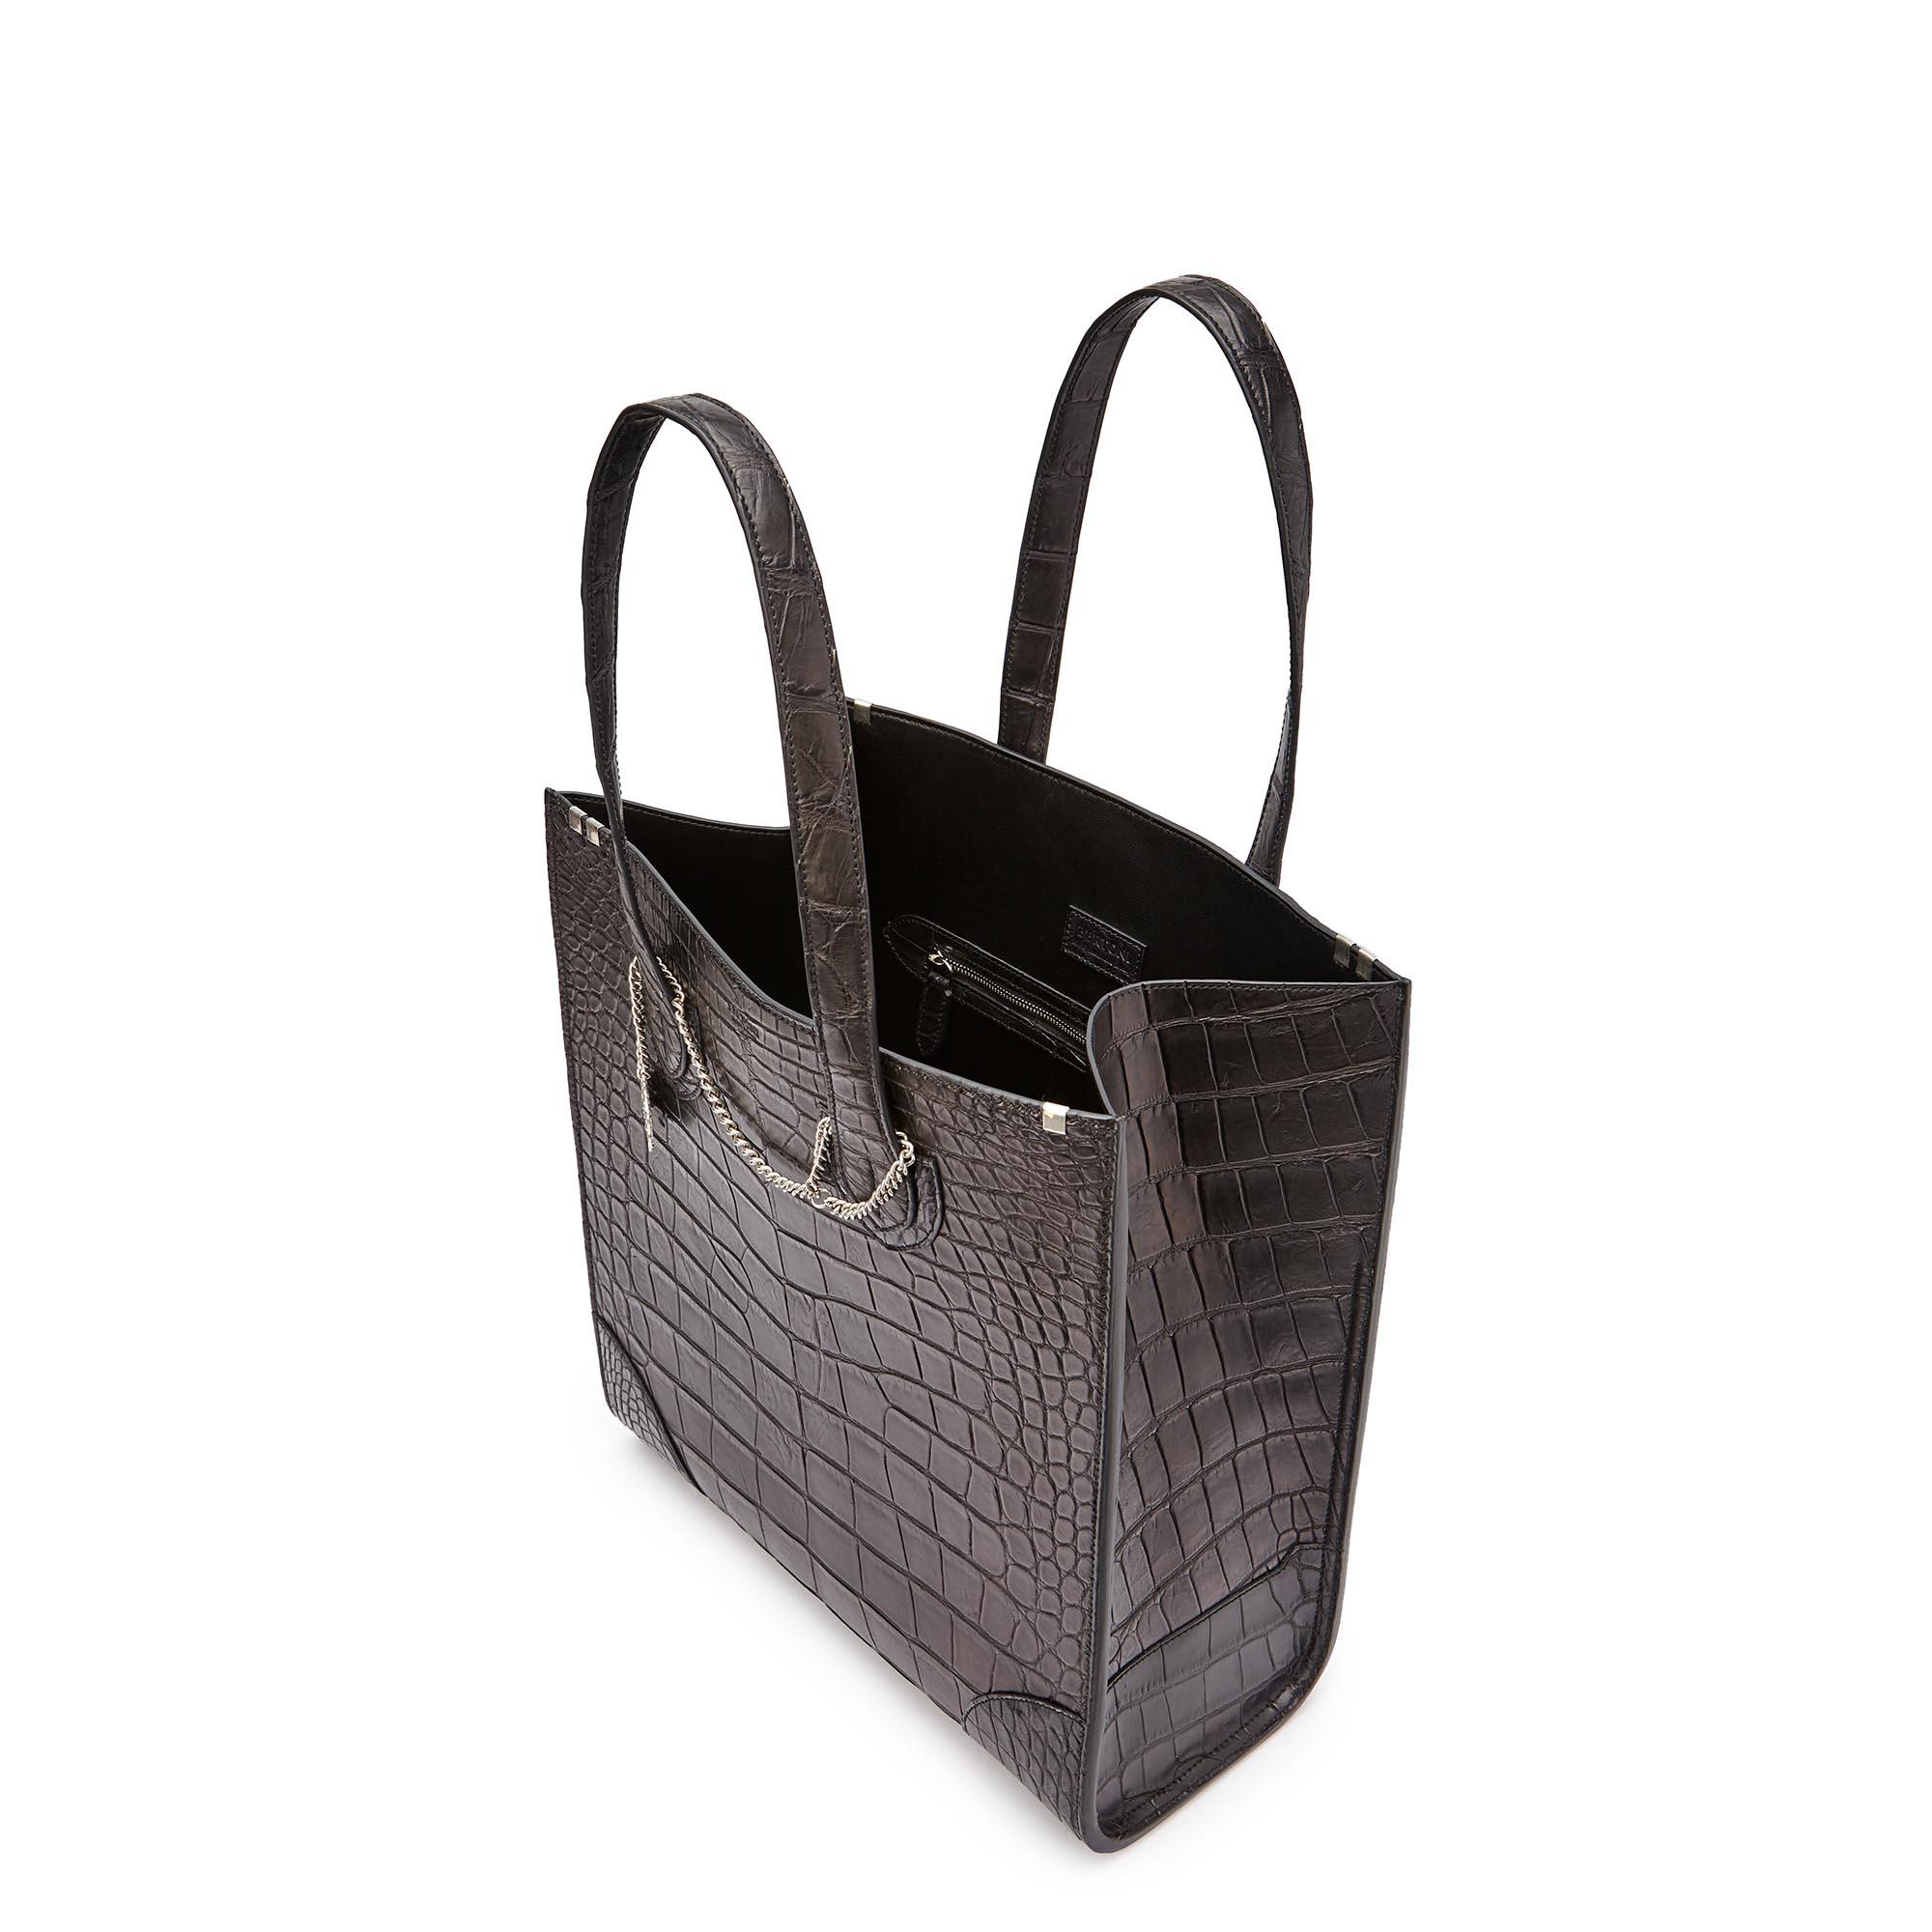 Signatura-Tote-black-alligator-bag-Bertoni-1949_03